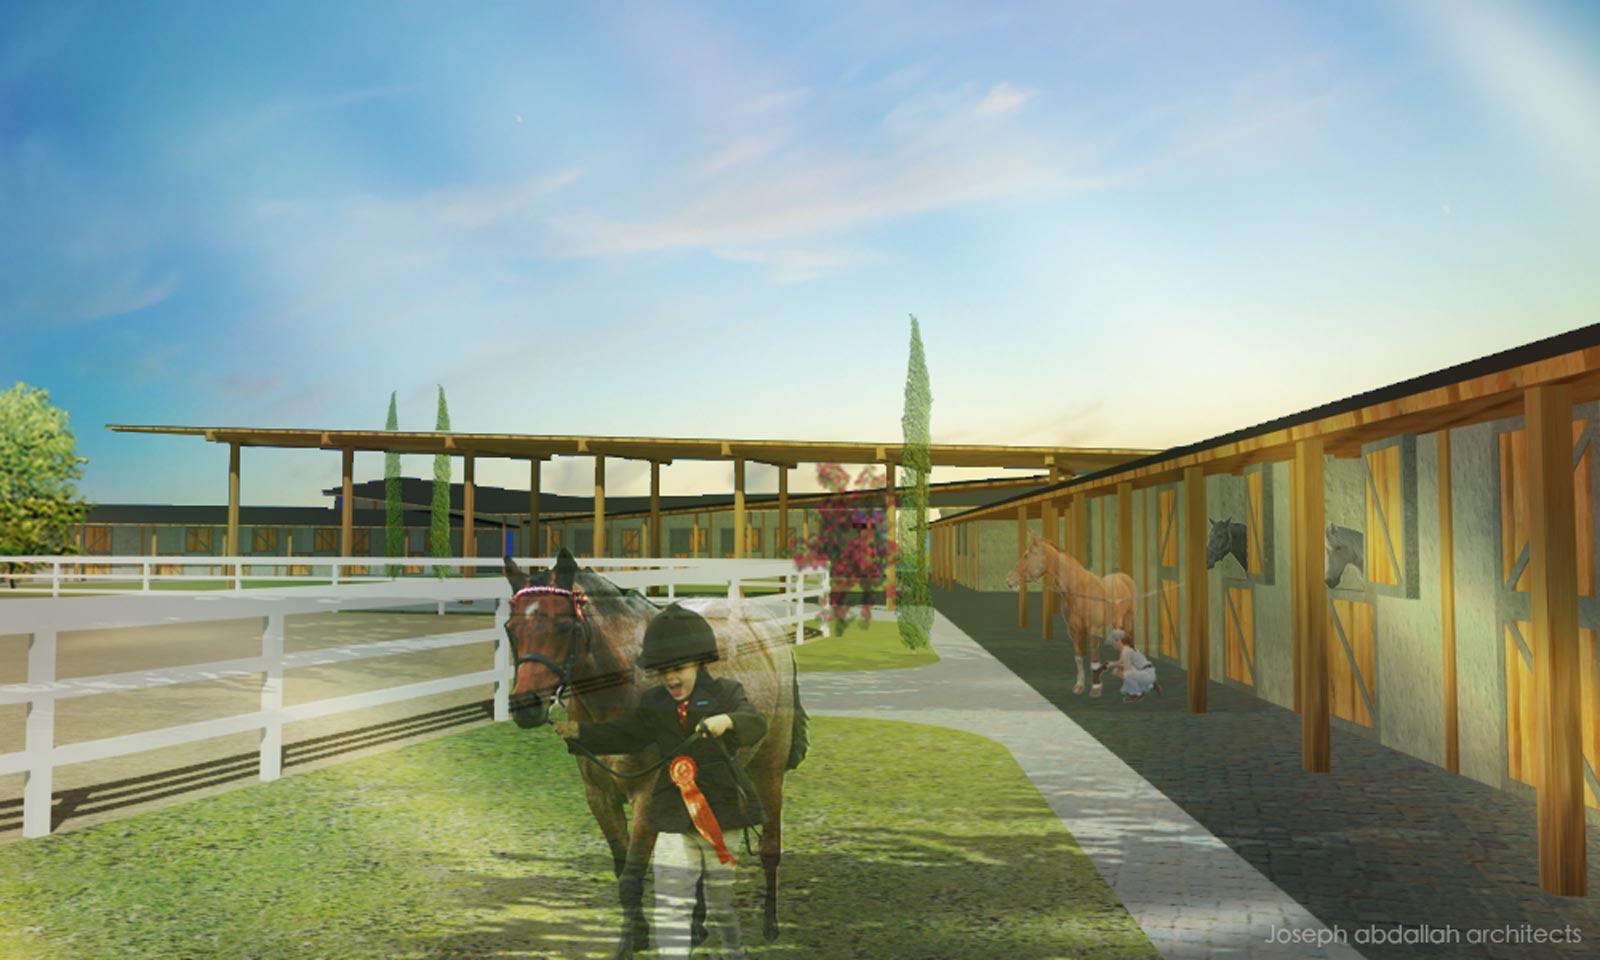 hechmi-equestrian-horse-back-riding-sport-lebanon-joseph-abdallah-architects-5